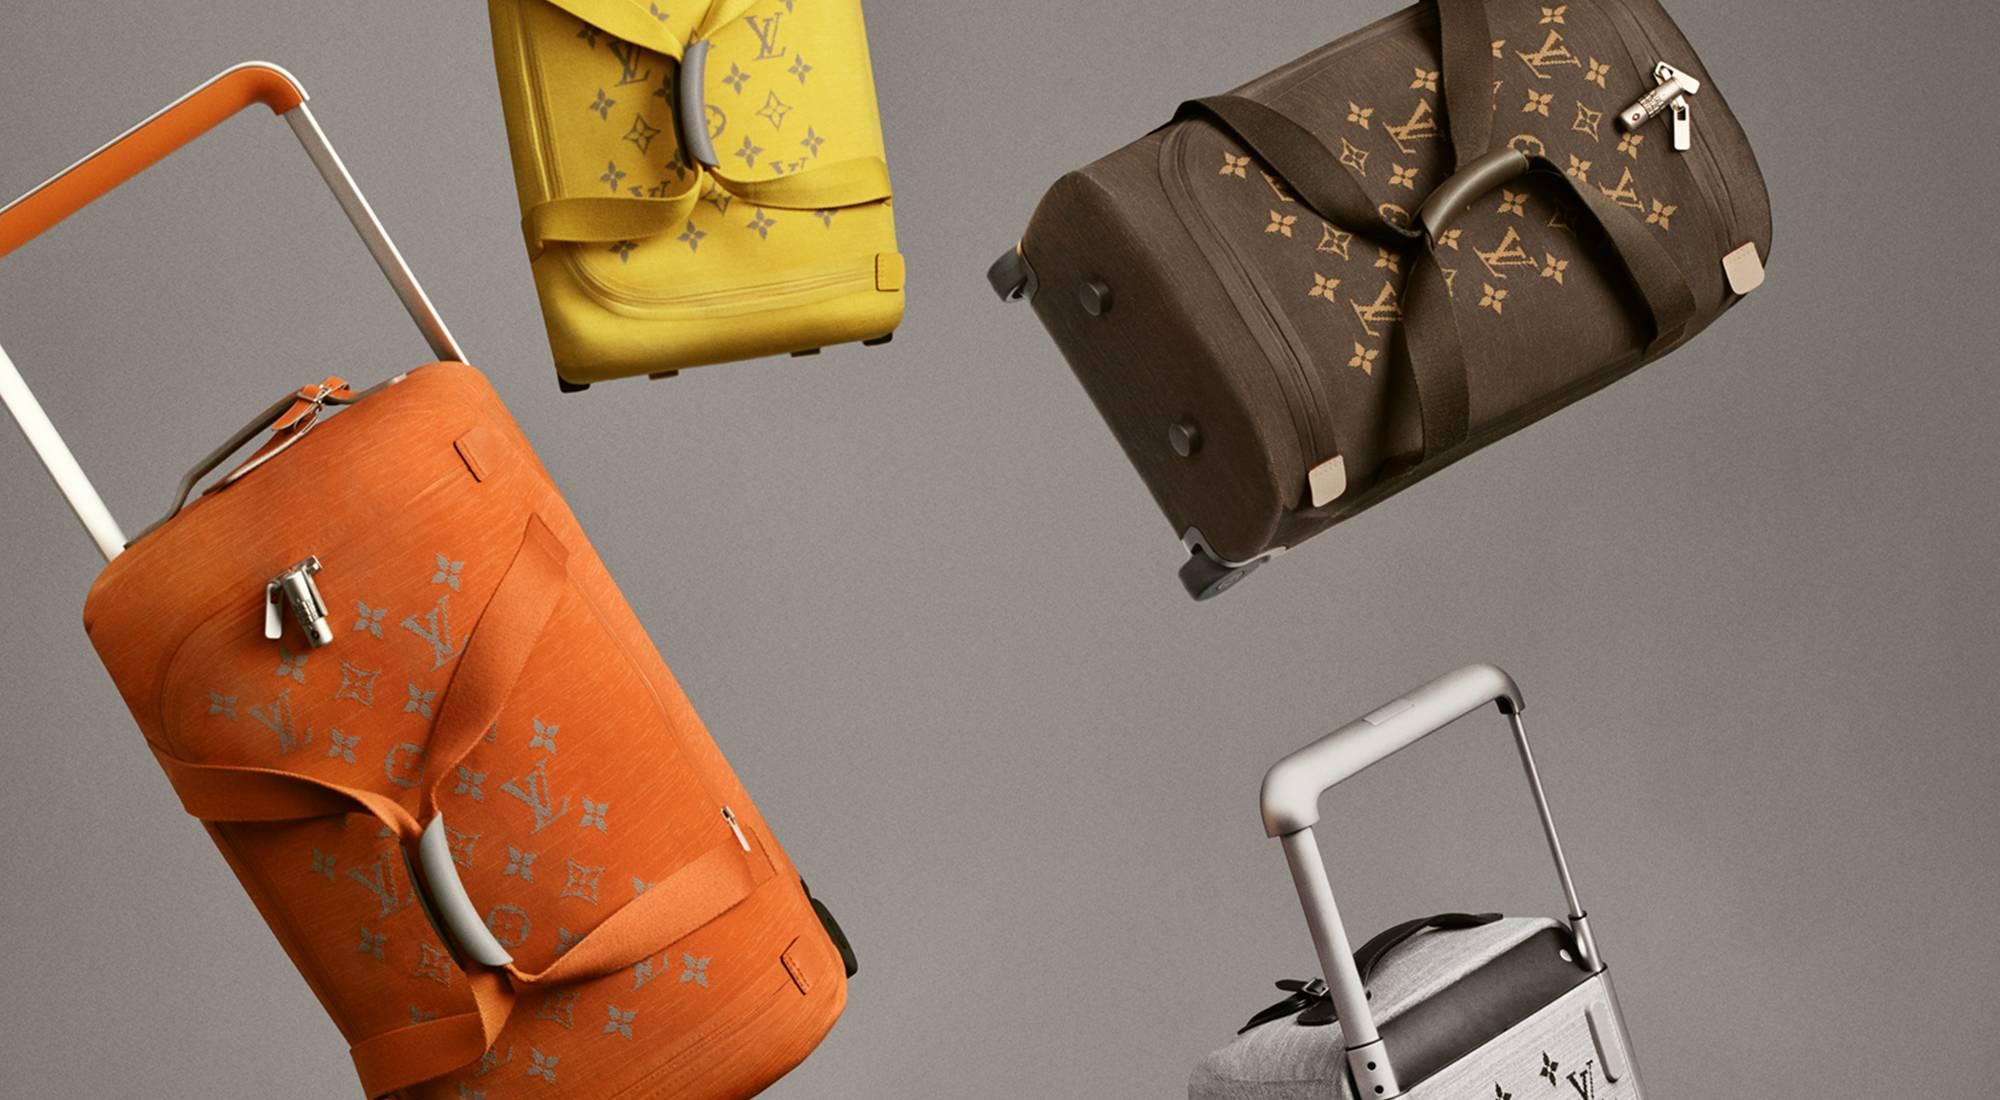 Louis Vuitton luggage bags.